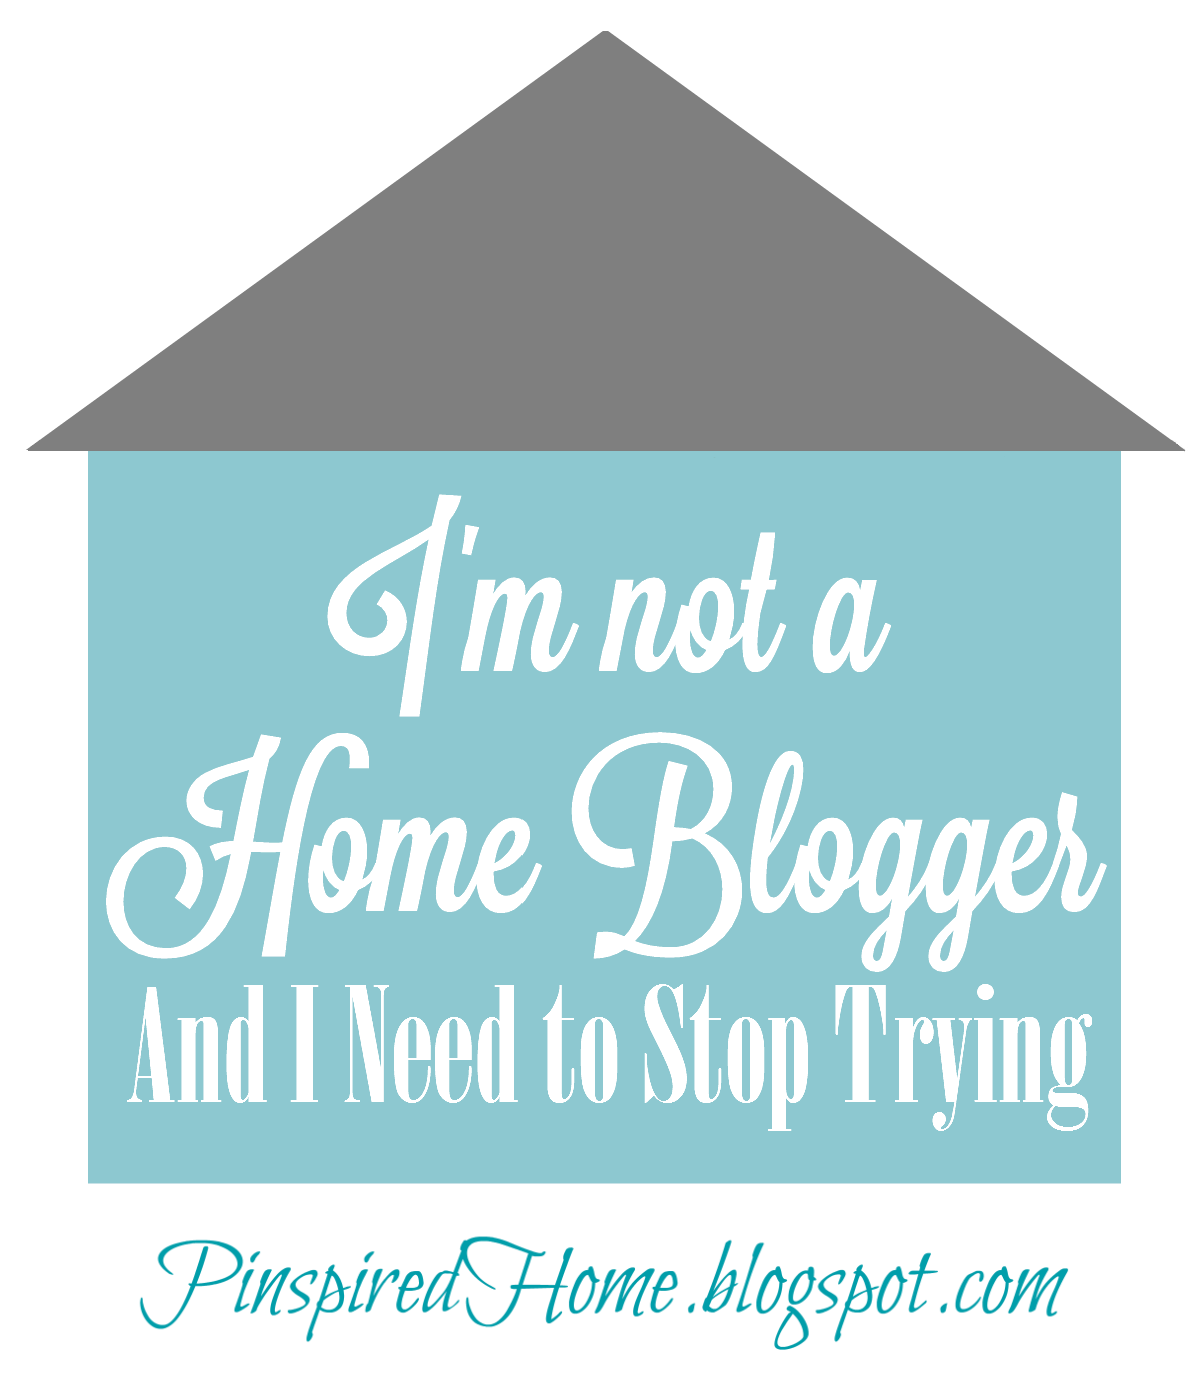 http://pinspiredhome.blogspot.com/2014/07/im-not-a-home-blogger.html